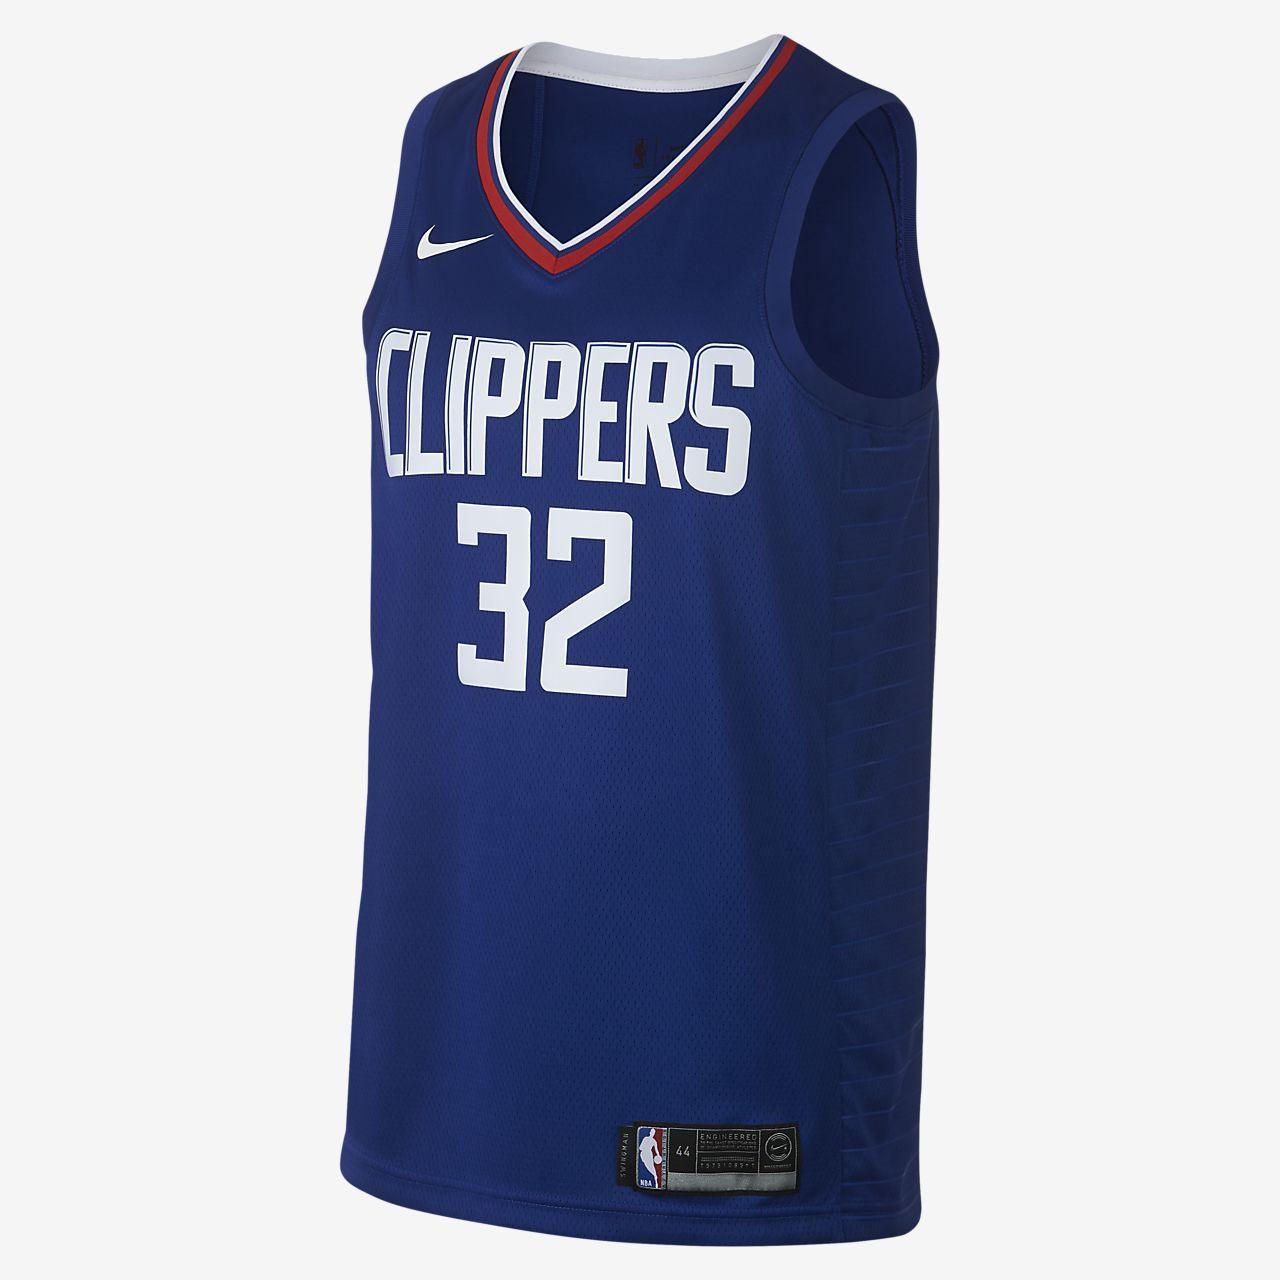 ... Maillot connecté Nike NBA Blake Griffin Icon Edition Swingman (LA  Clippers) pour Homme